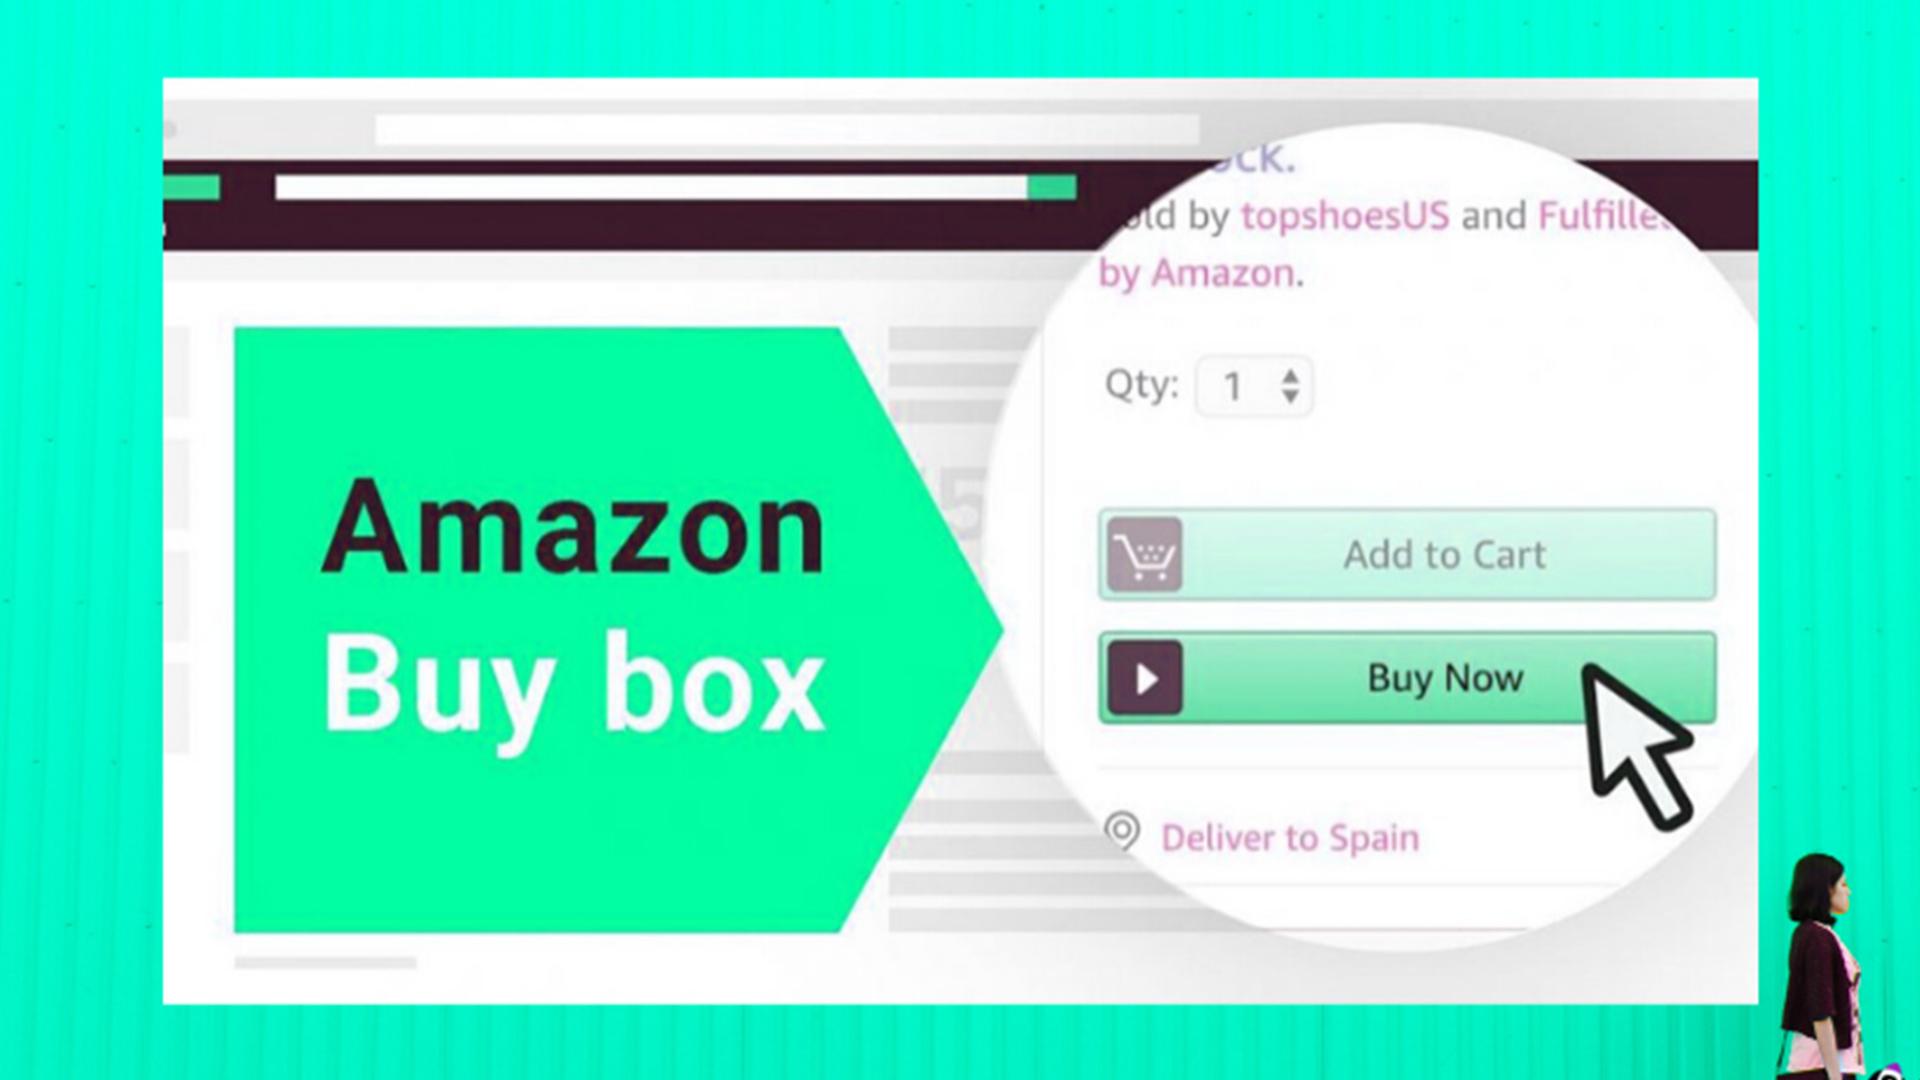 What is the Amazon Buy Box?